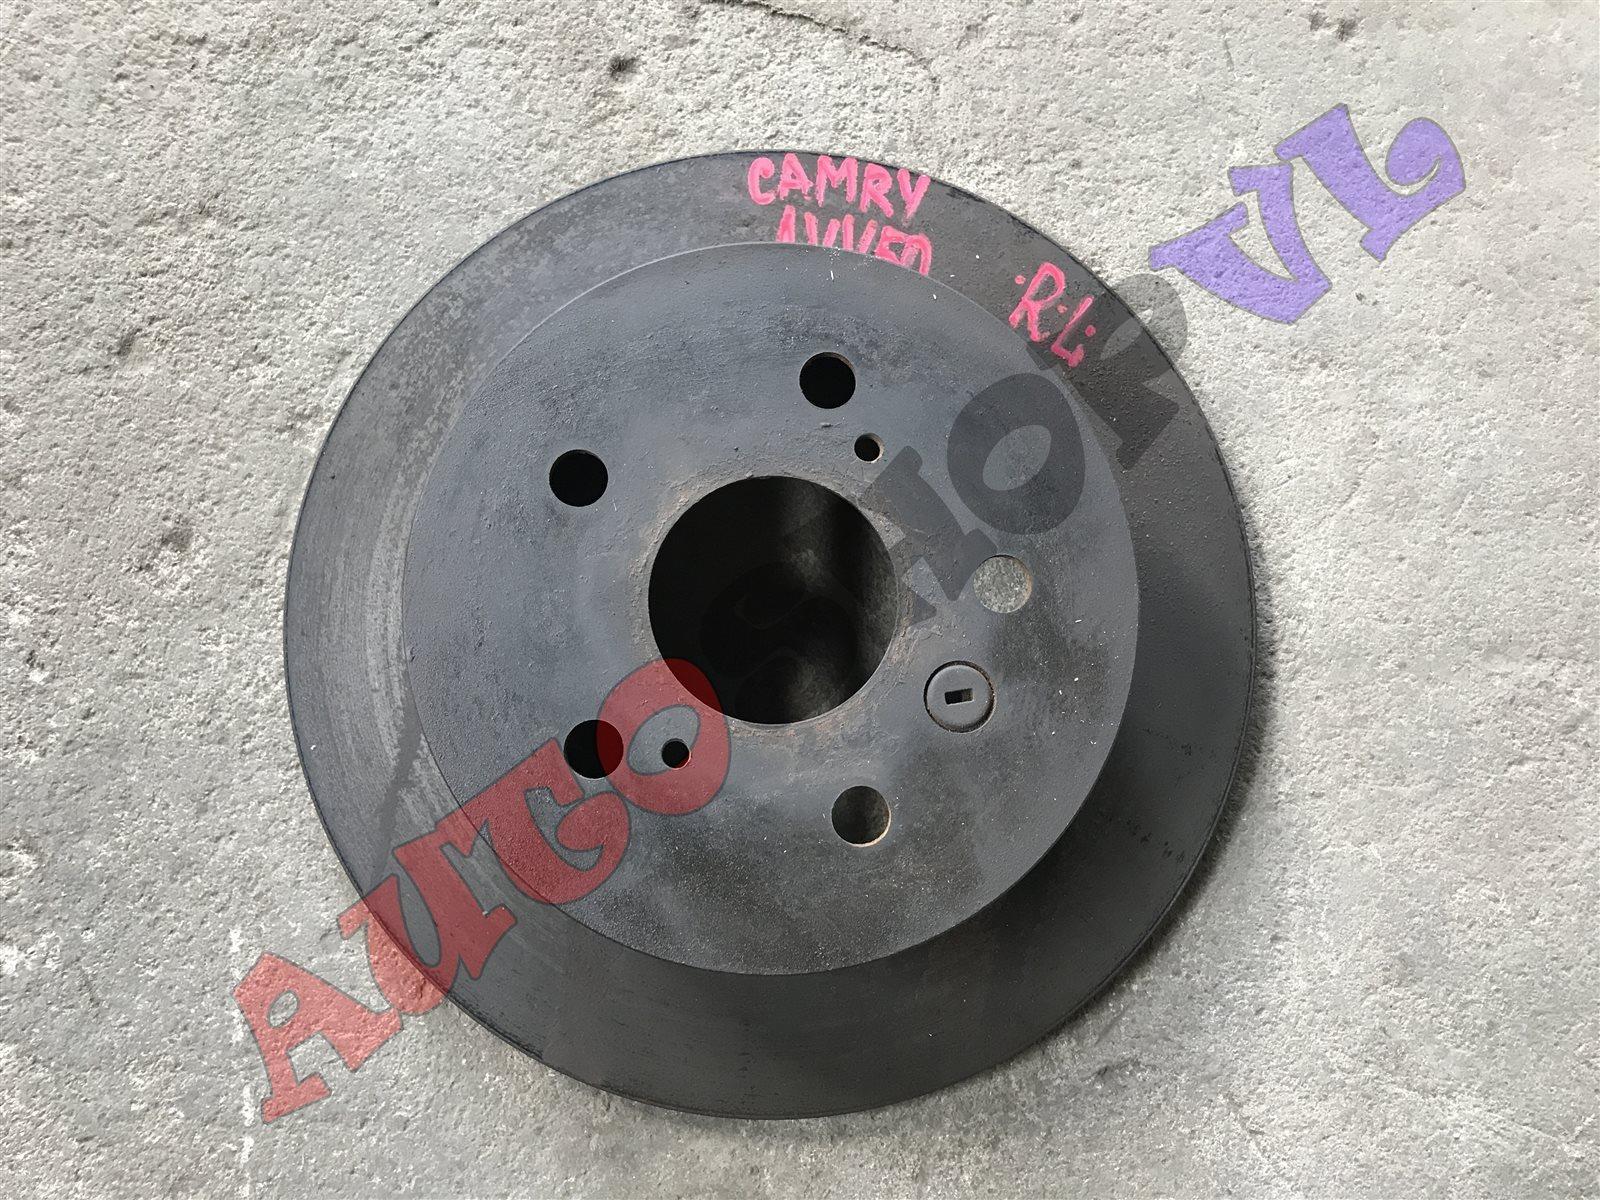 Тормозной диск Toyota Camry AVV50 2ARFXE 12.2011г. задний левый (б/у)